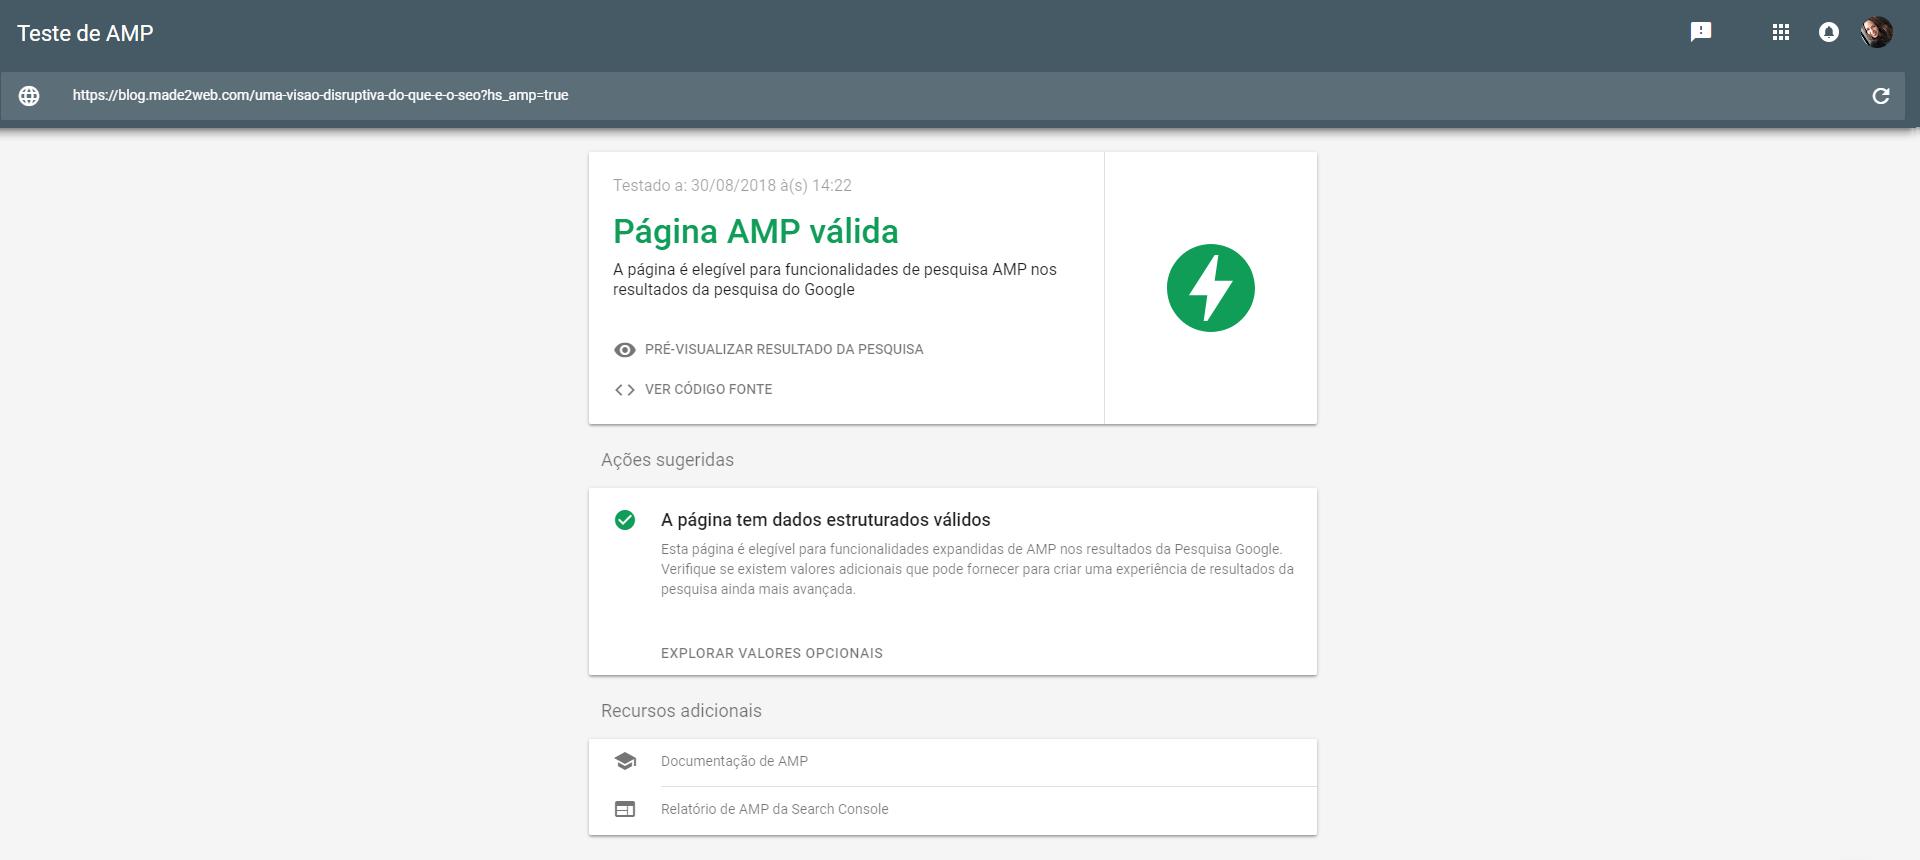 teste-pagina-mobile-amp-made2web